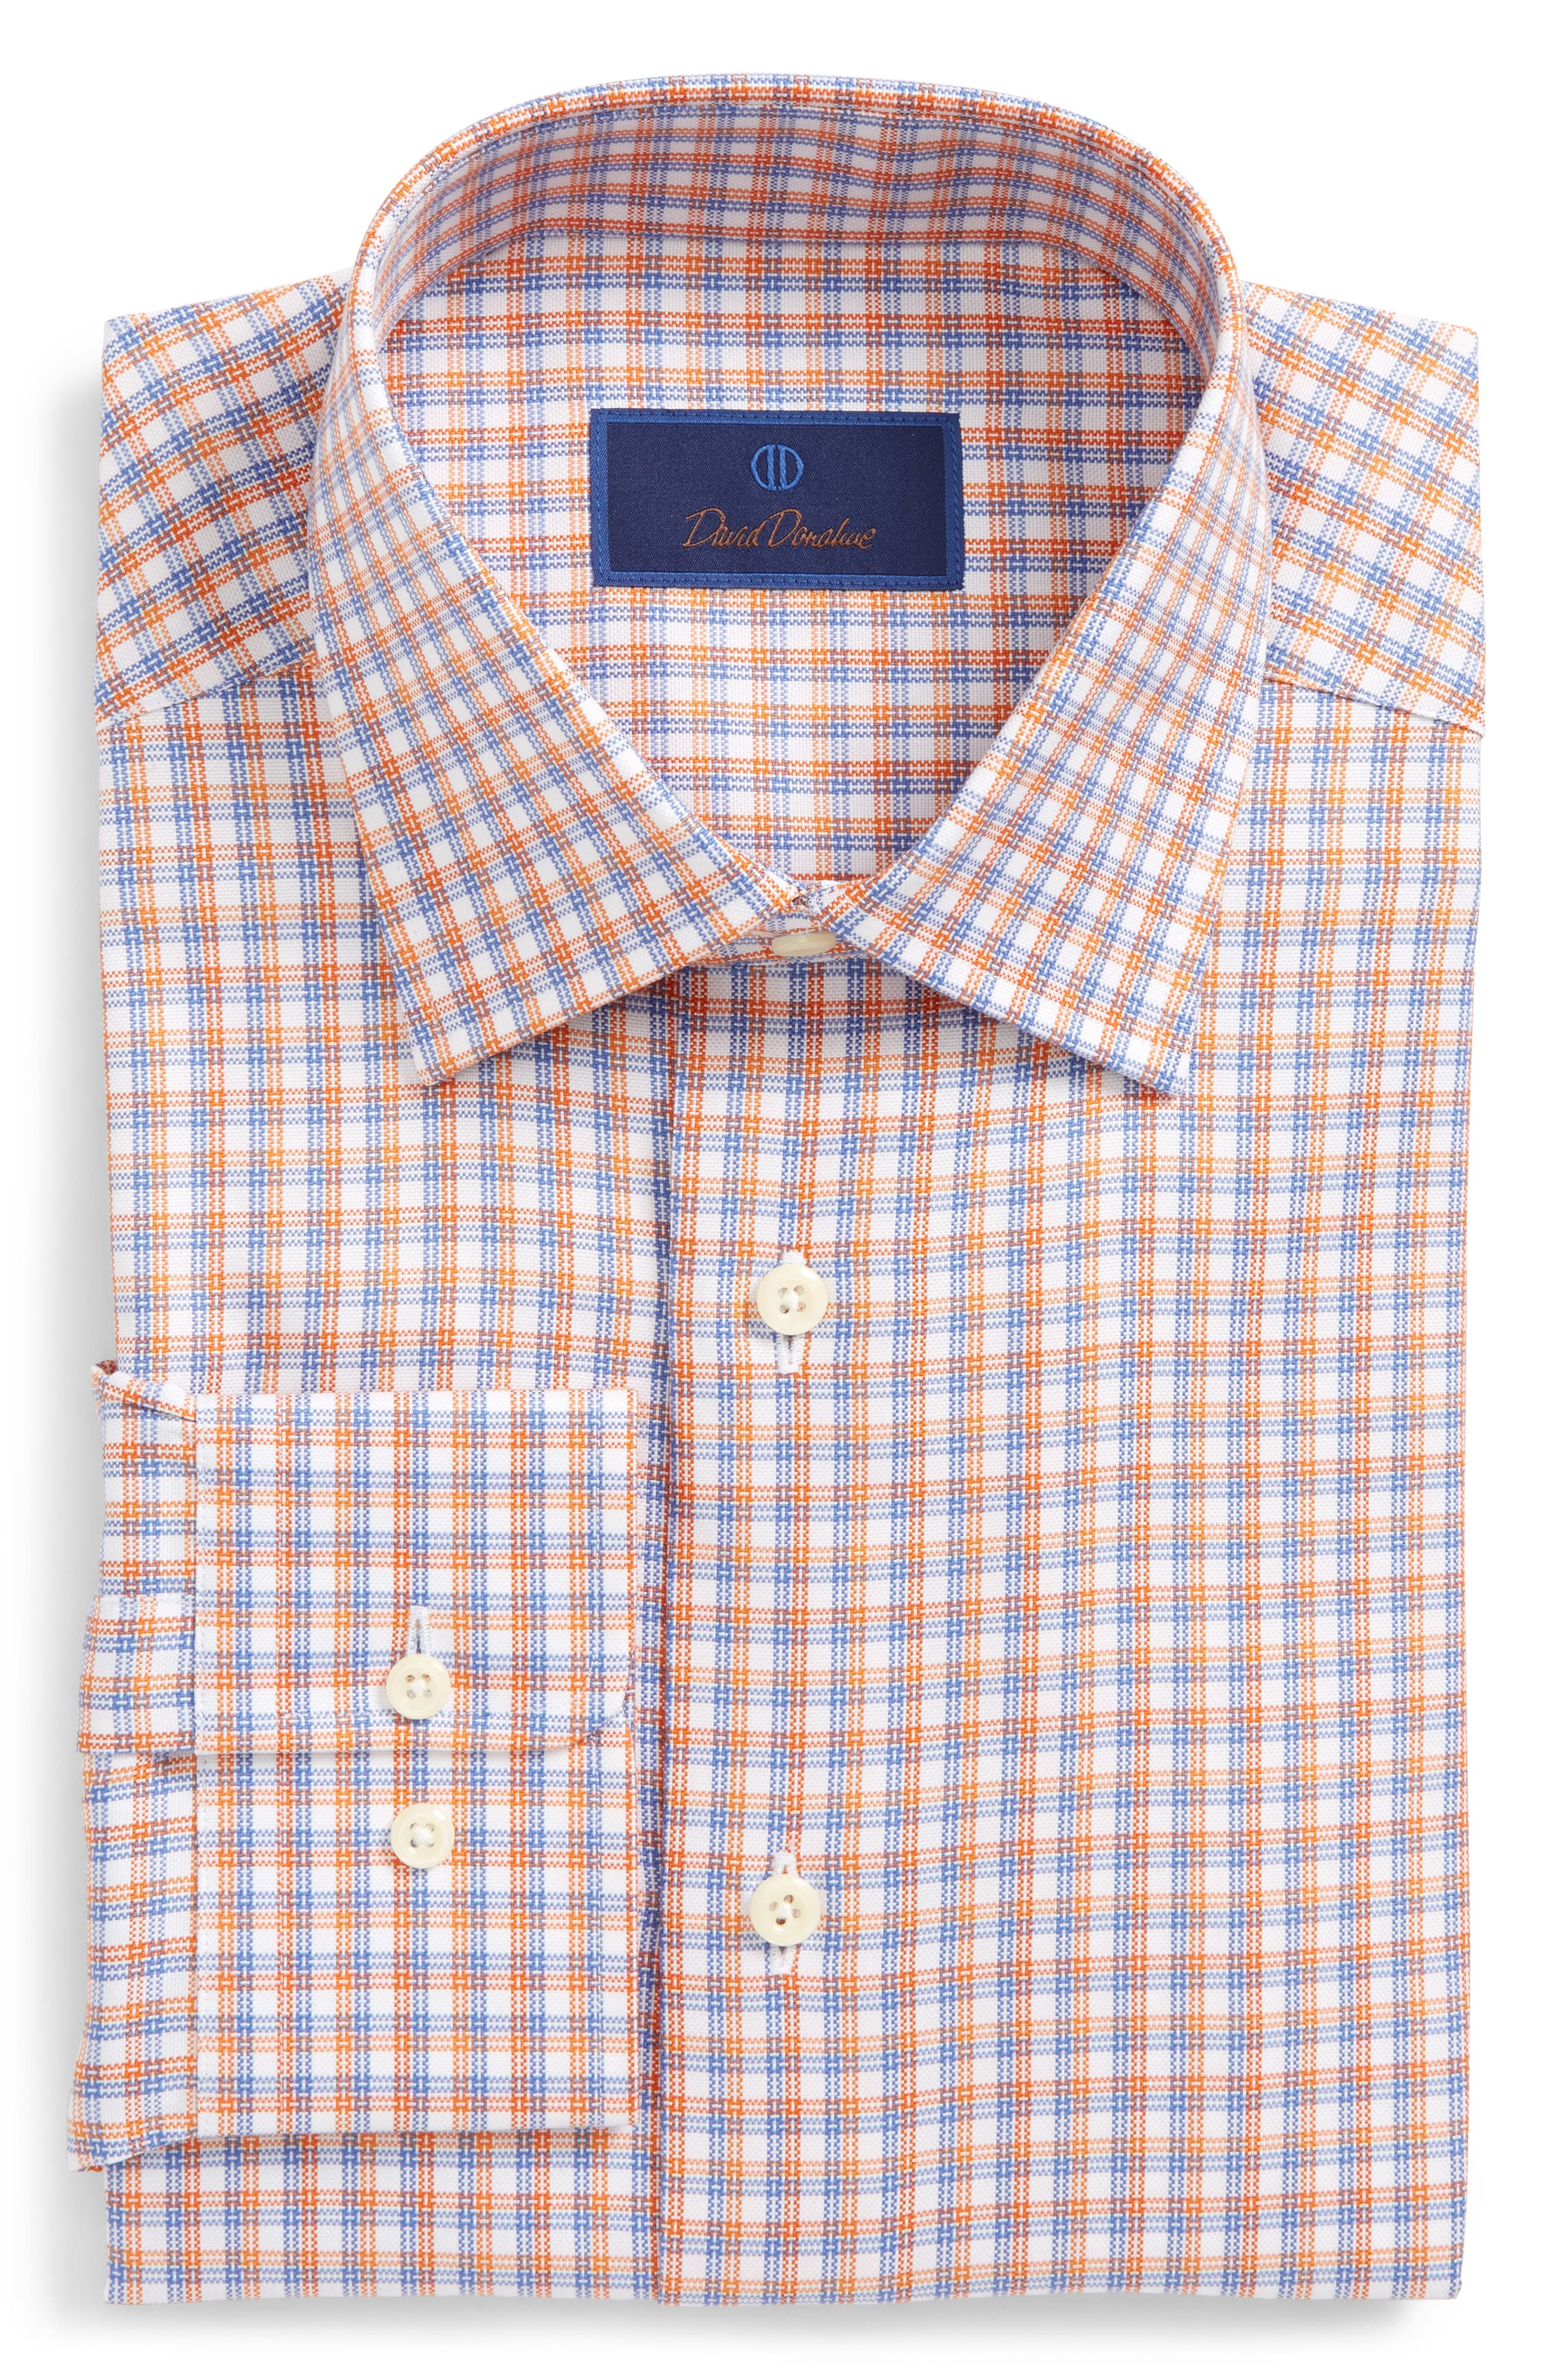 Regular Fit Plaid Dress Shirt,                         Main,                         color, 830